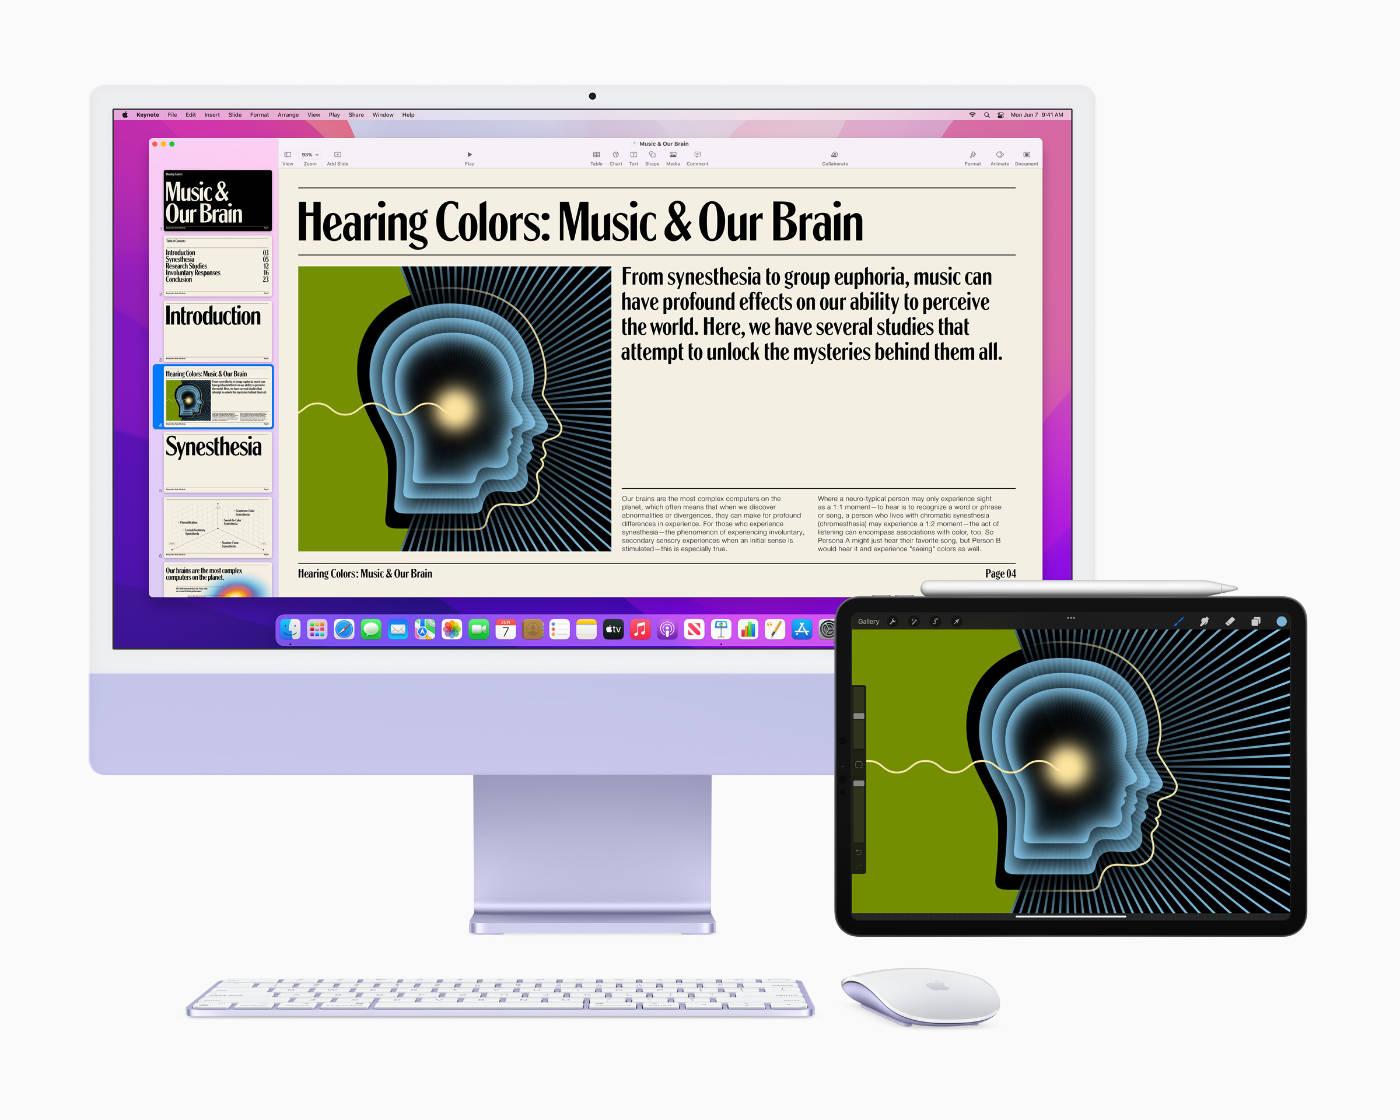 Universal Control on Mac and iPad